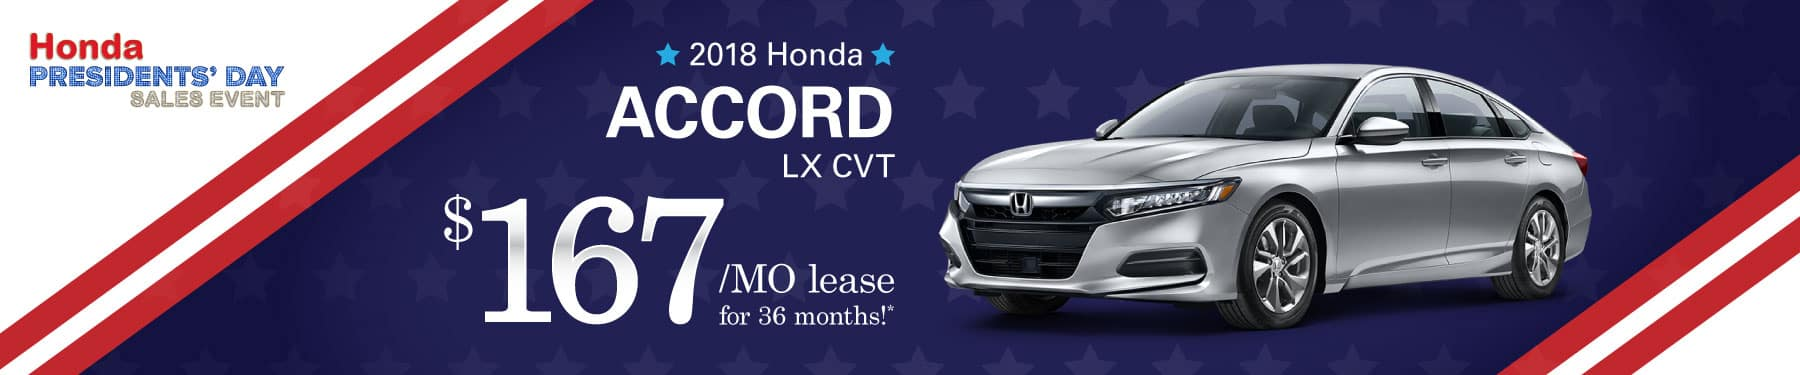 Header Photo of the new 2018 Honda Accord